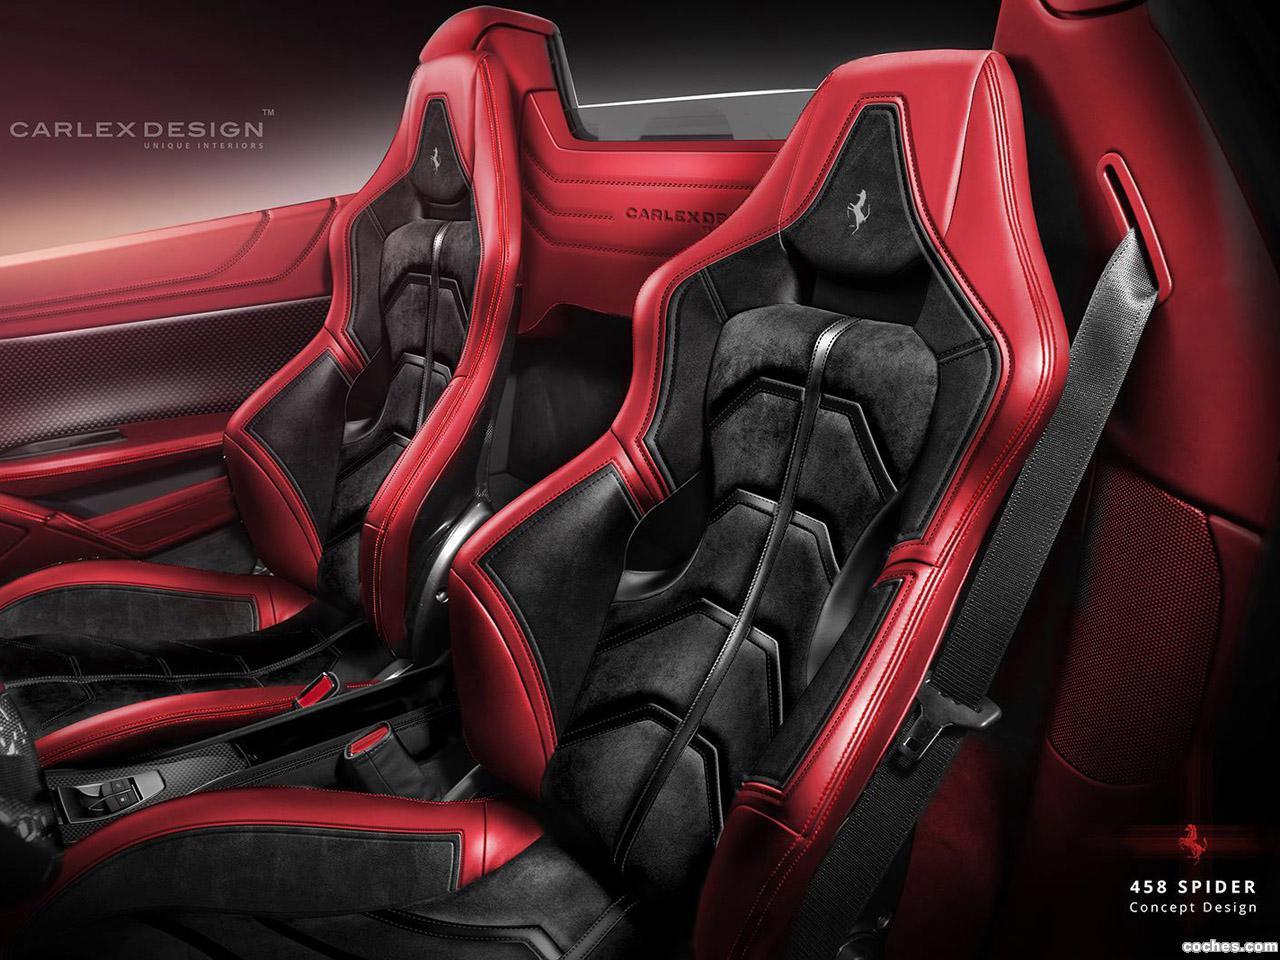 2015 ferrari 458 concept - photo #34